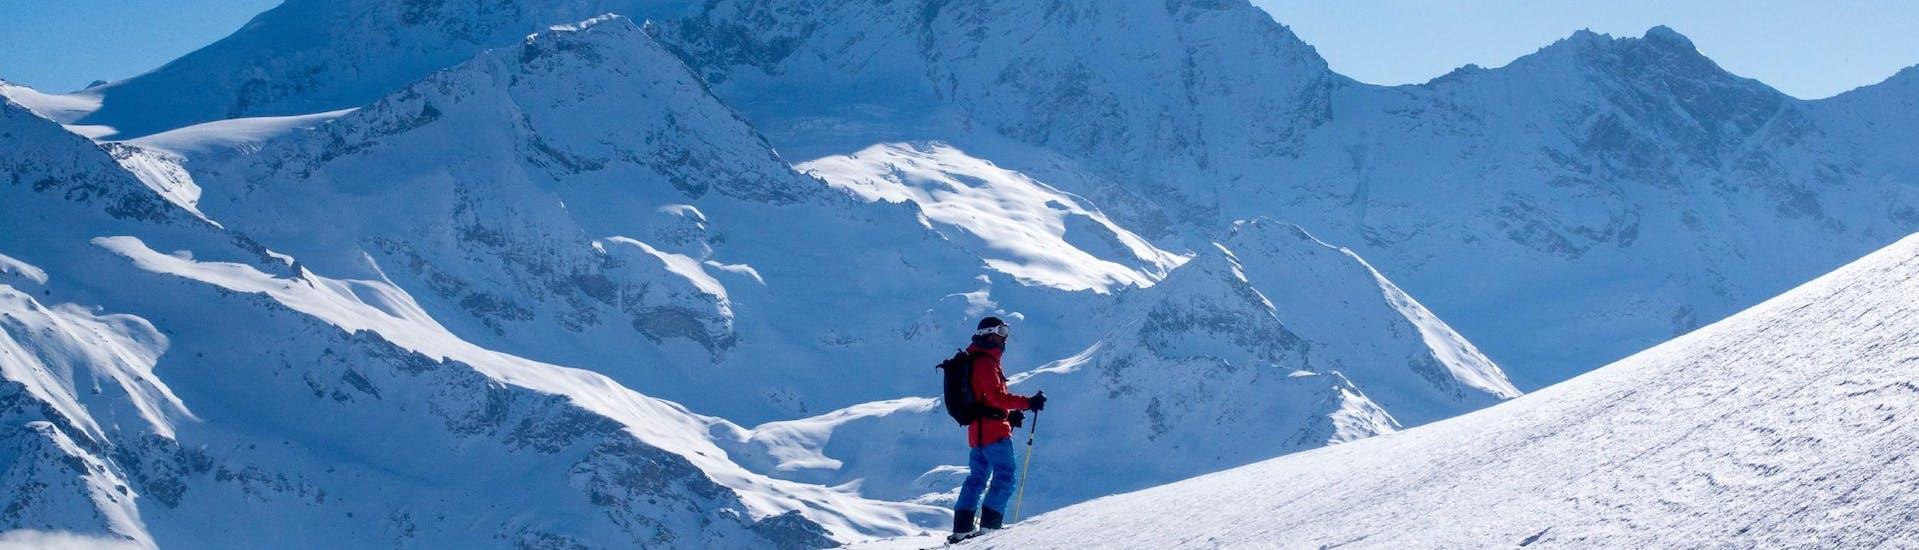 Ski Safari for Adults